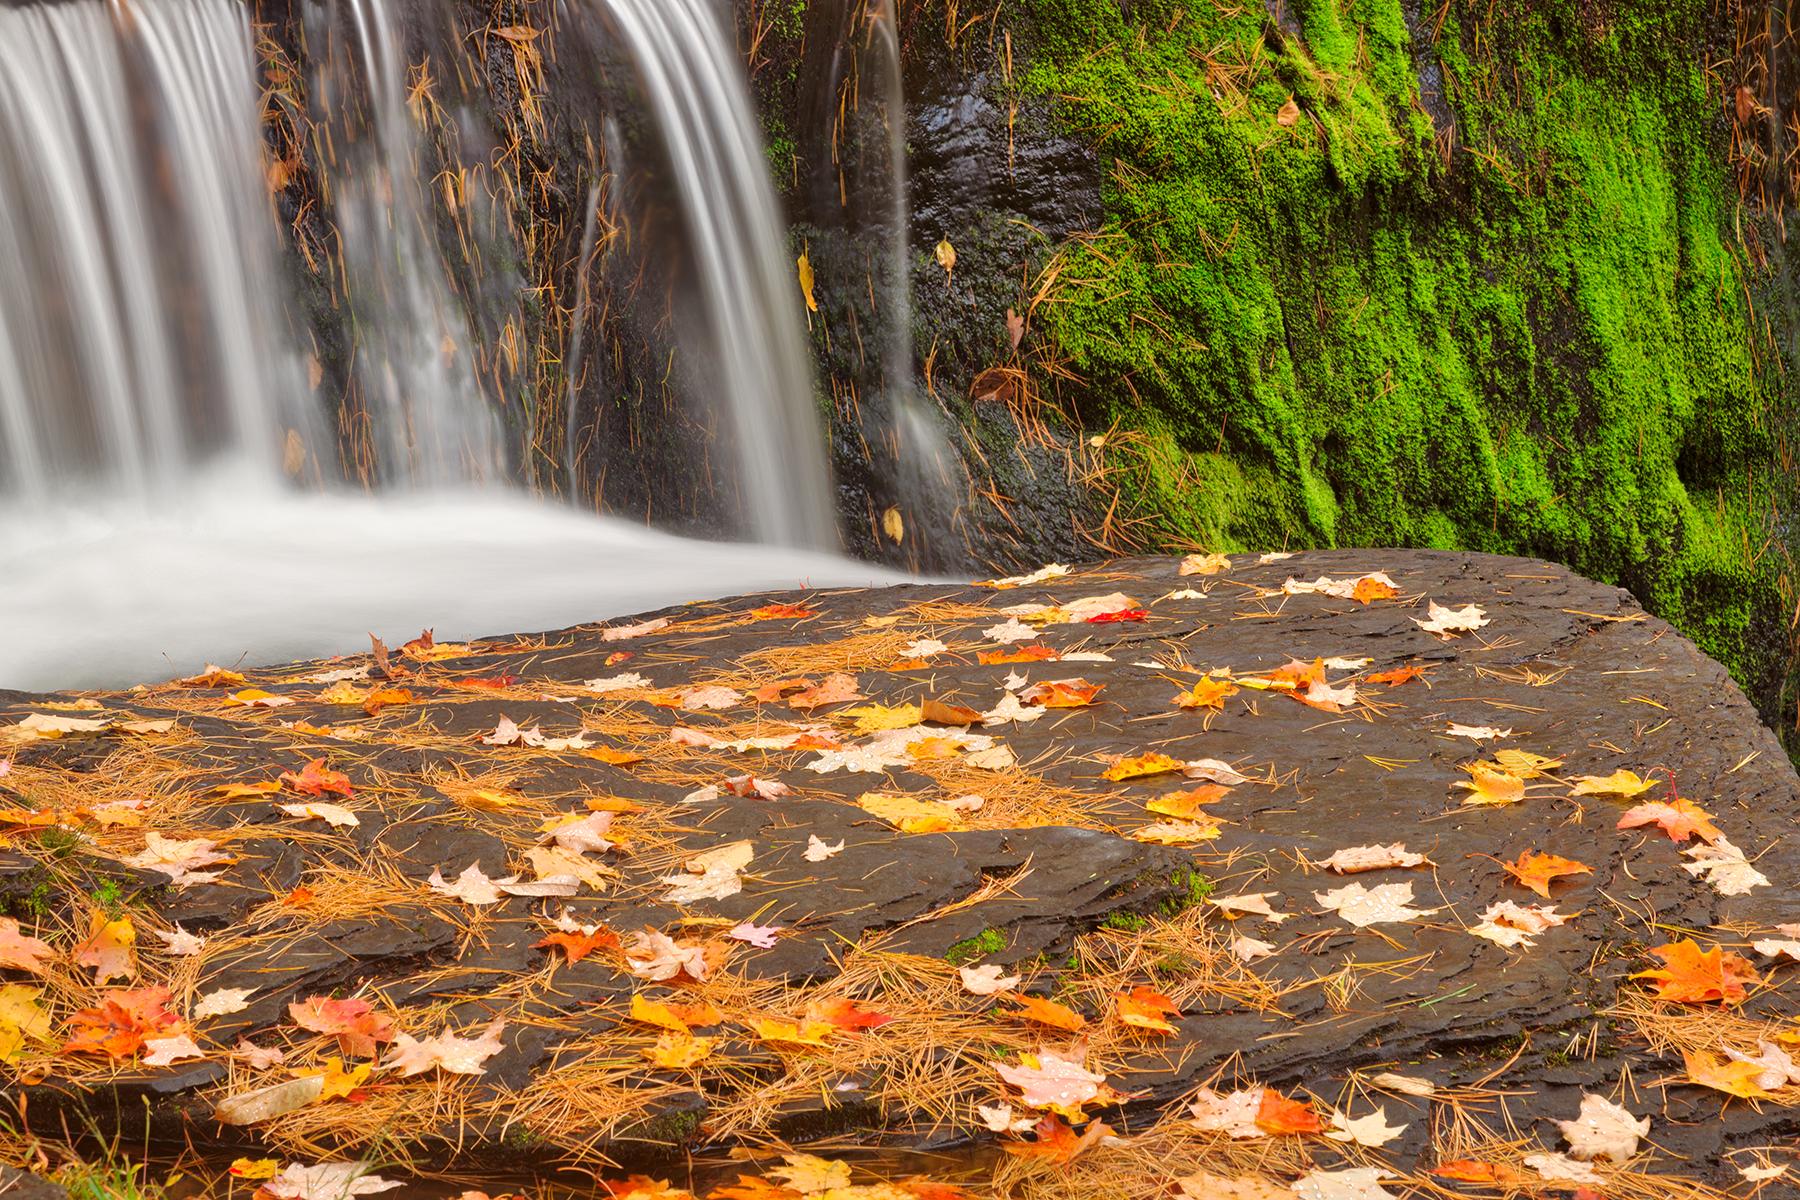 Autumn moss factory falls - hdr photo